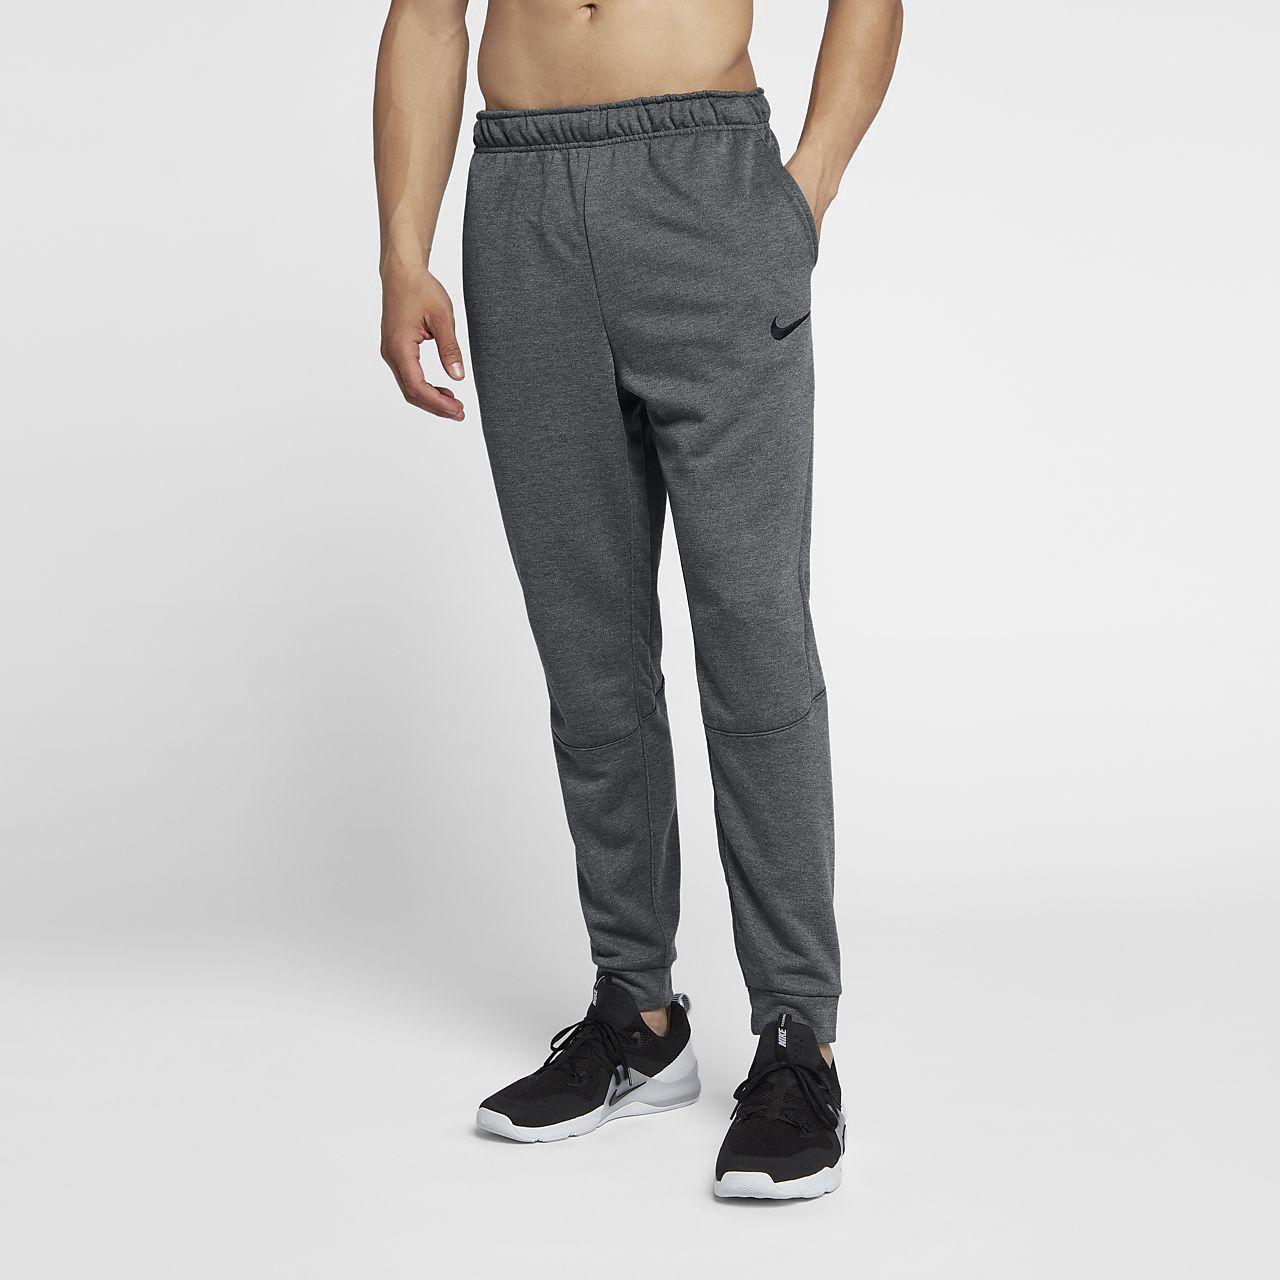 m tall nike pants